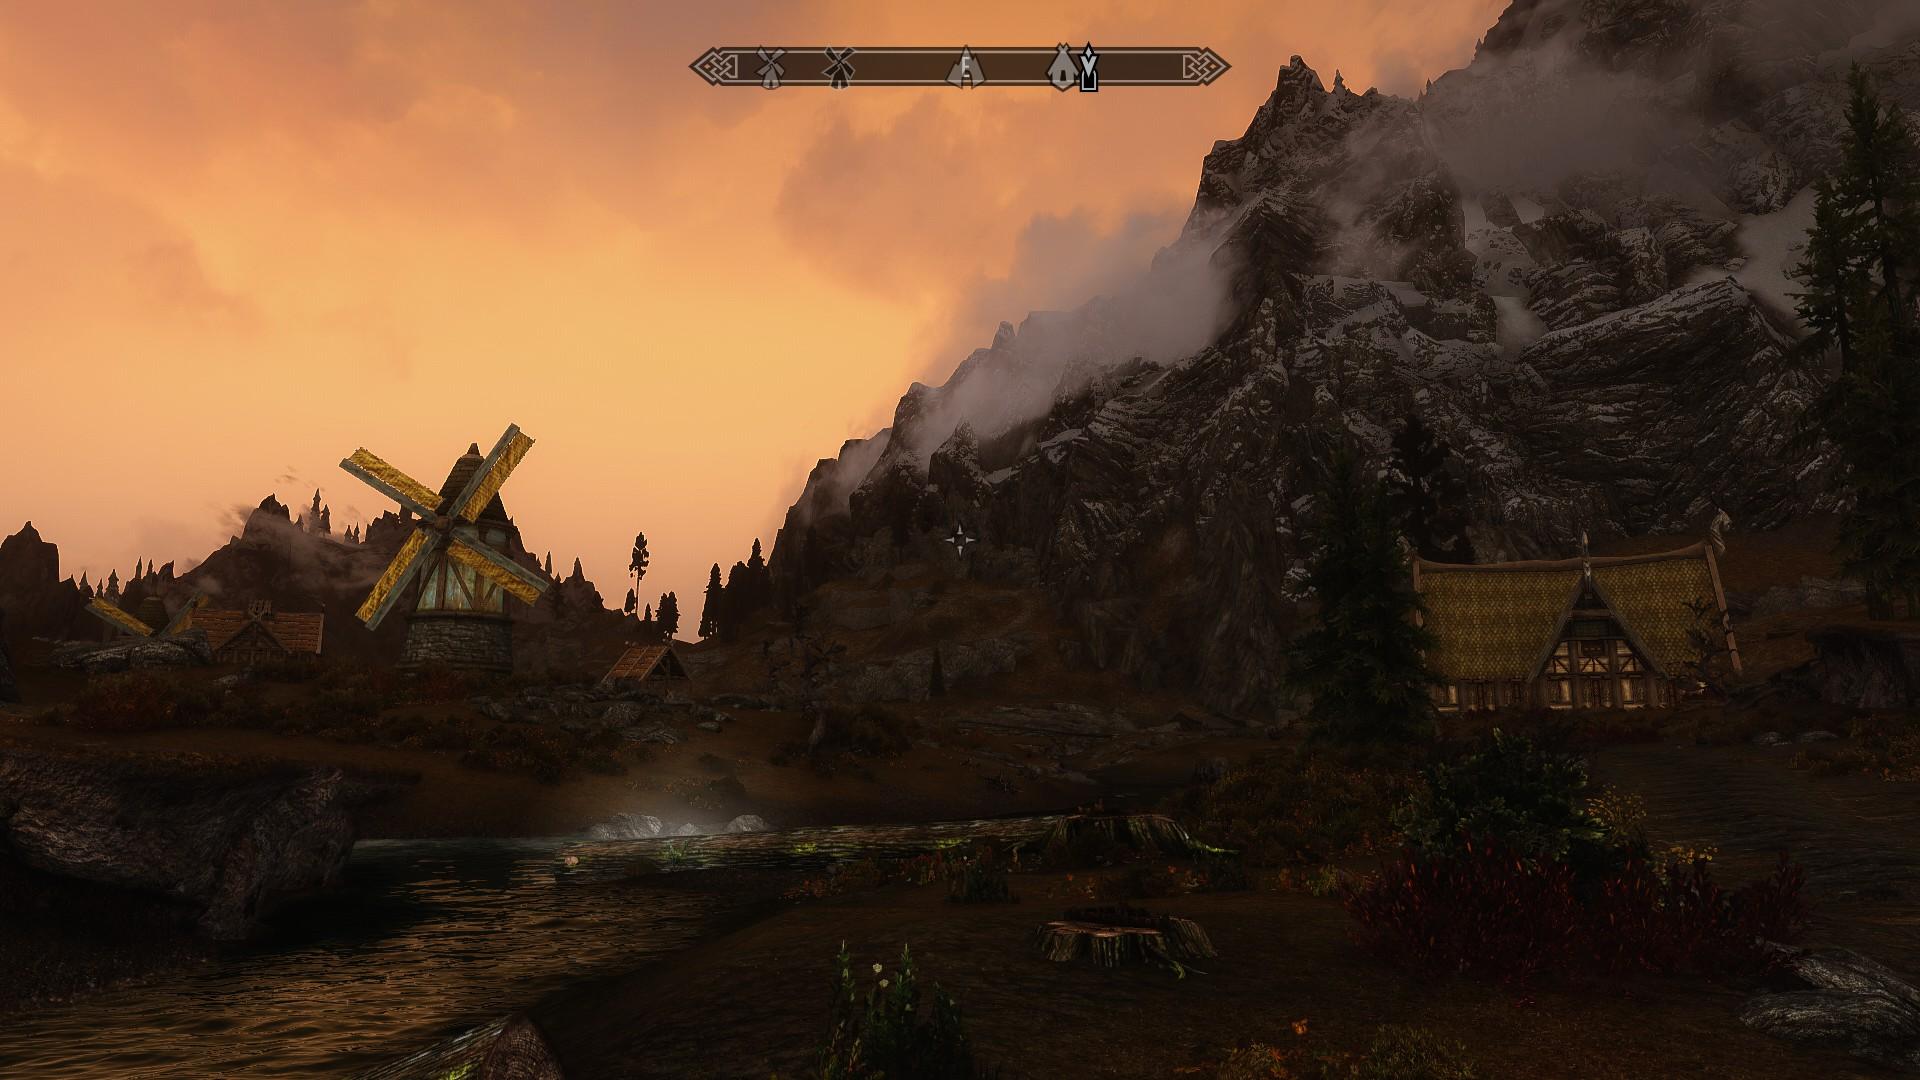 Skyrim: mods and tweaks - Games - Quarter To Three Forums